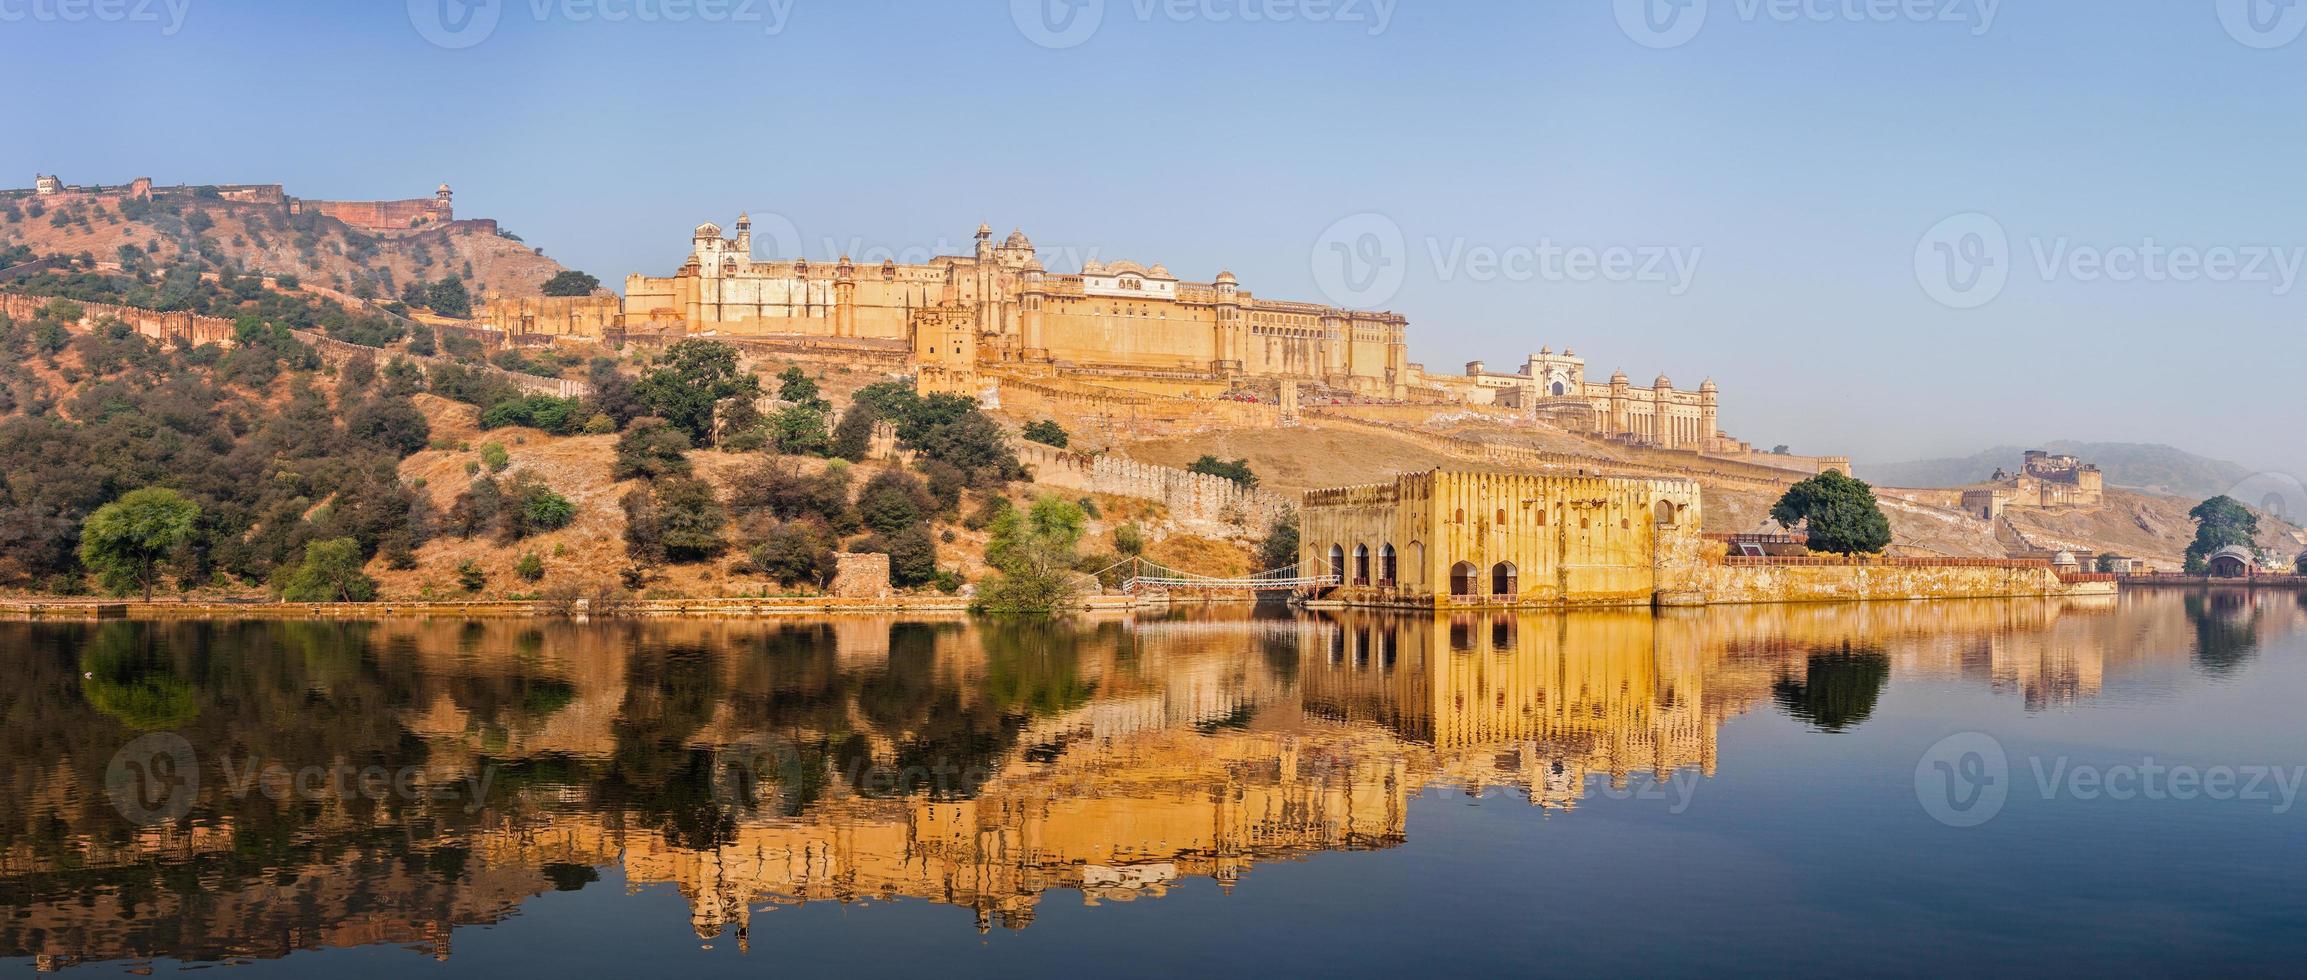 Panorama of Amer (Amber) fort, Rajasthan, India photo